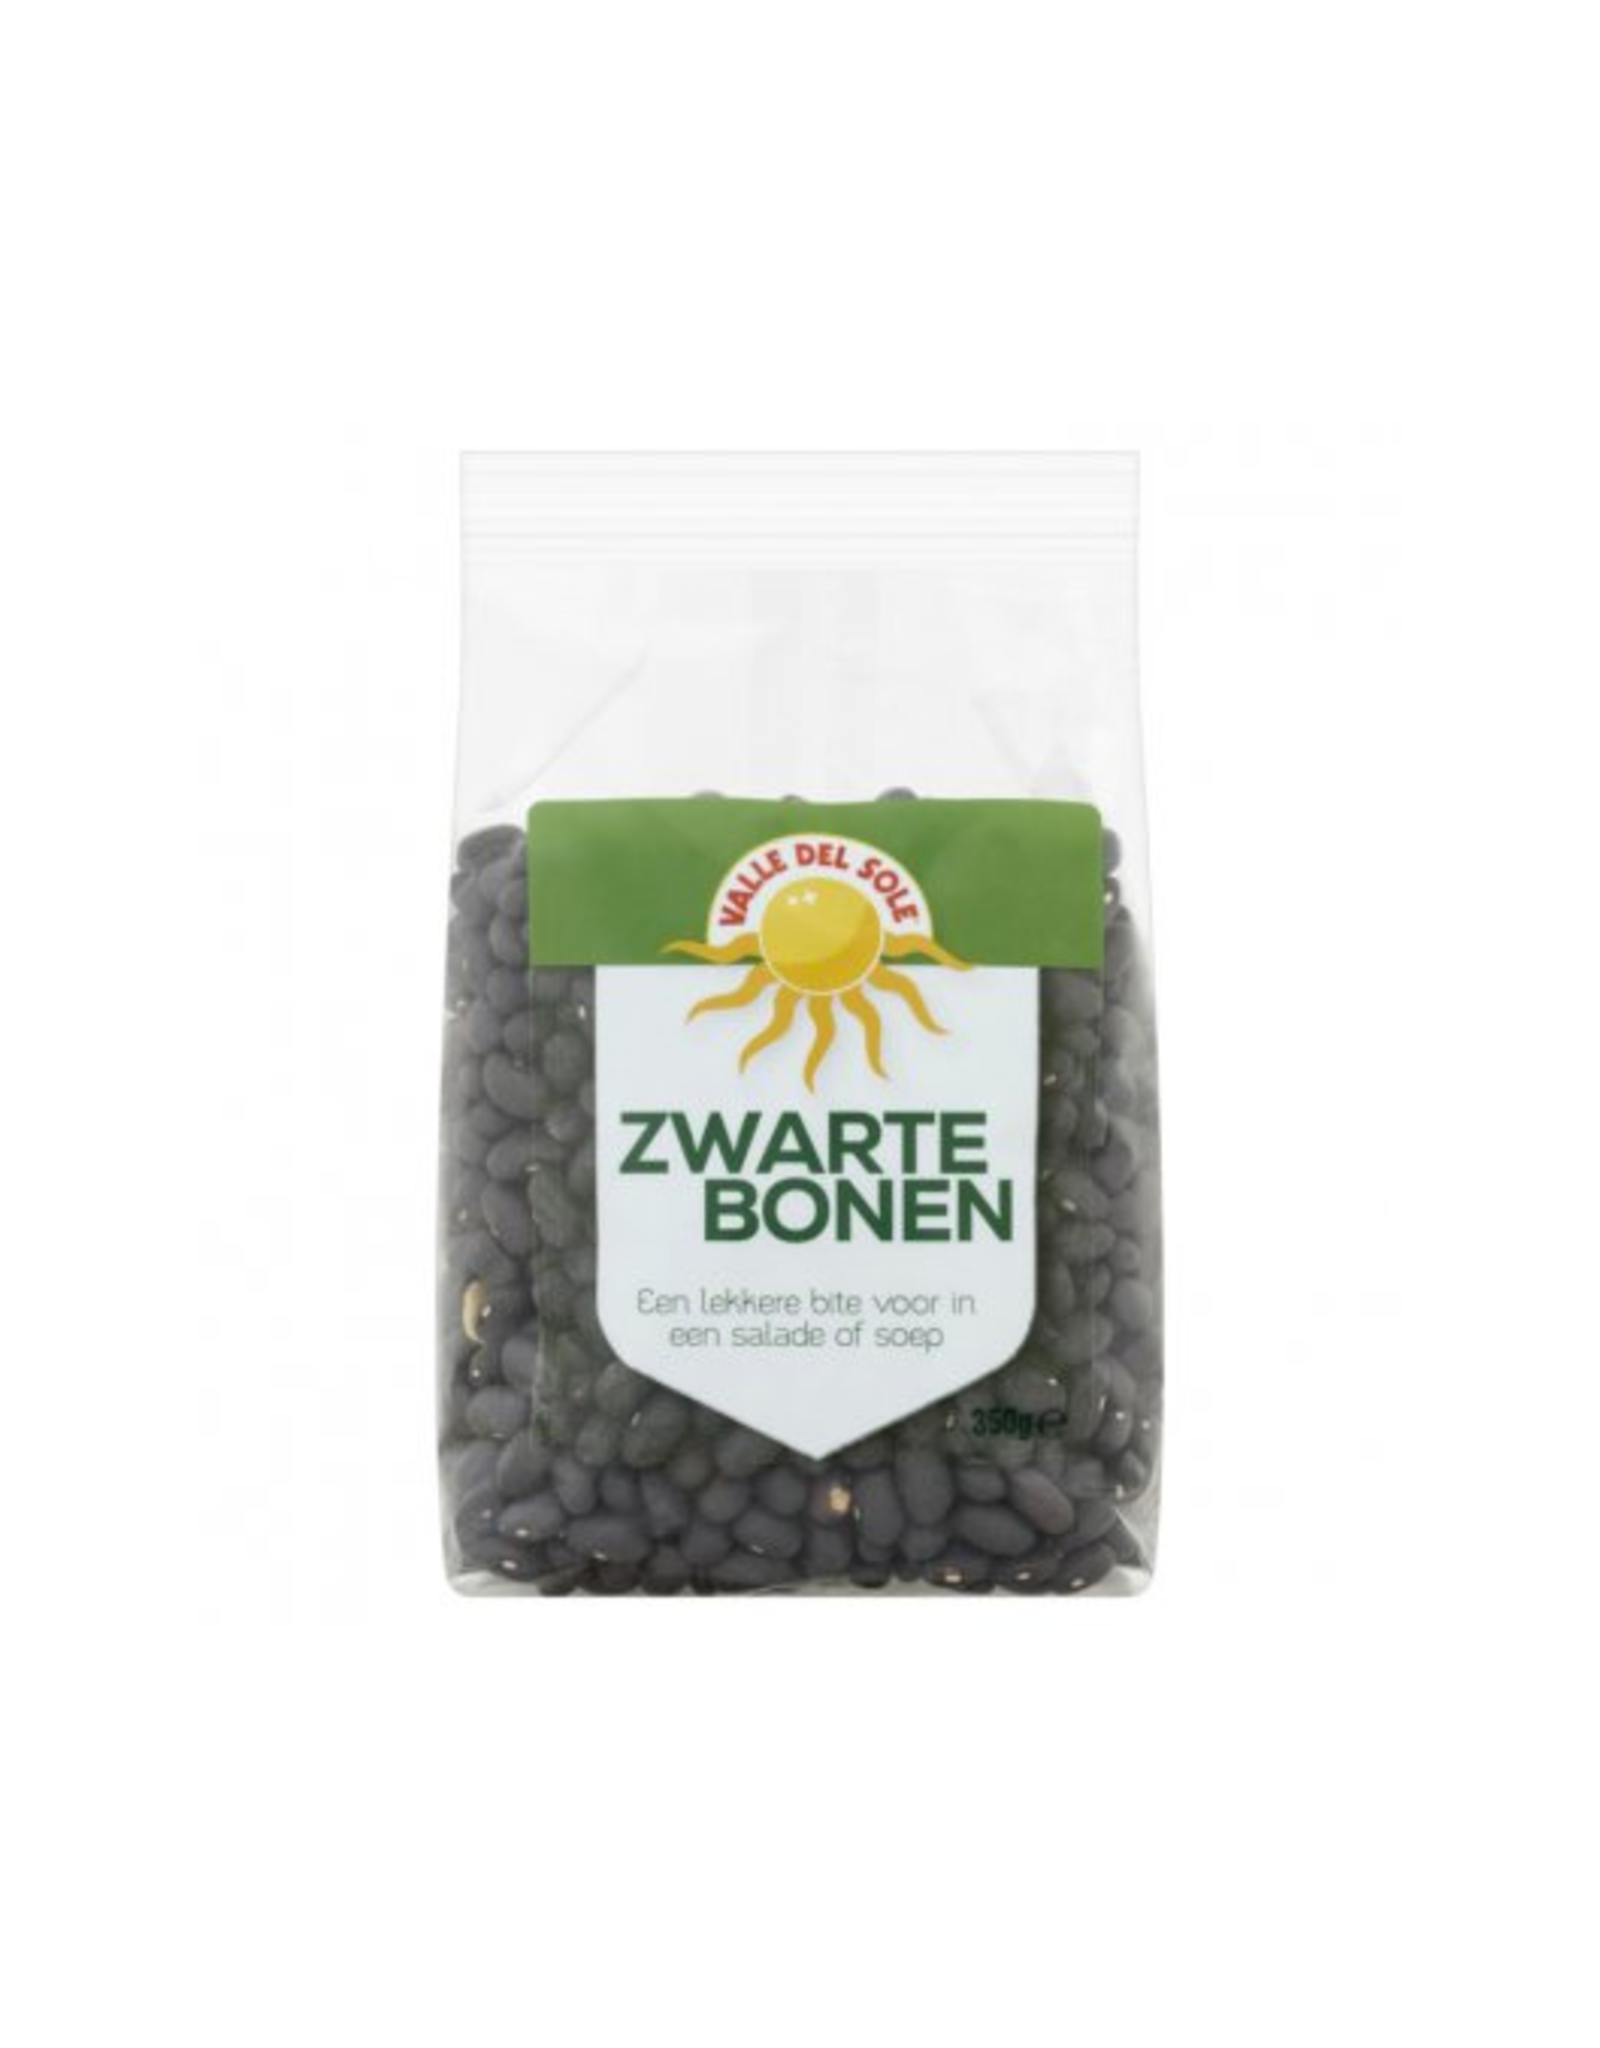 Valle del Sole Black Turtle Beans Zwarte Bonen 350gr